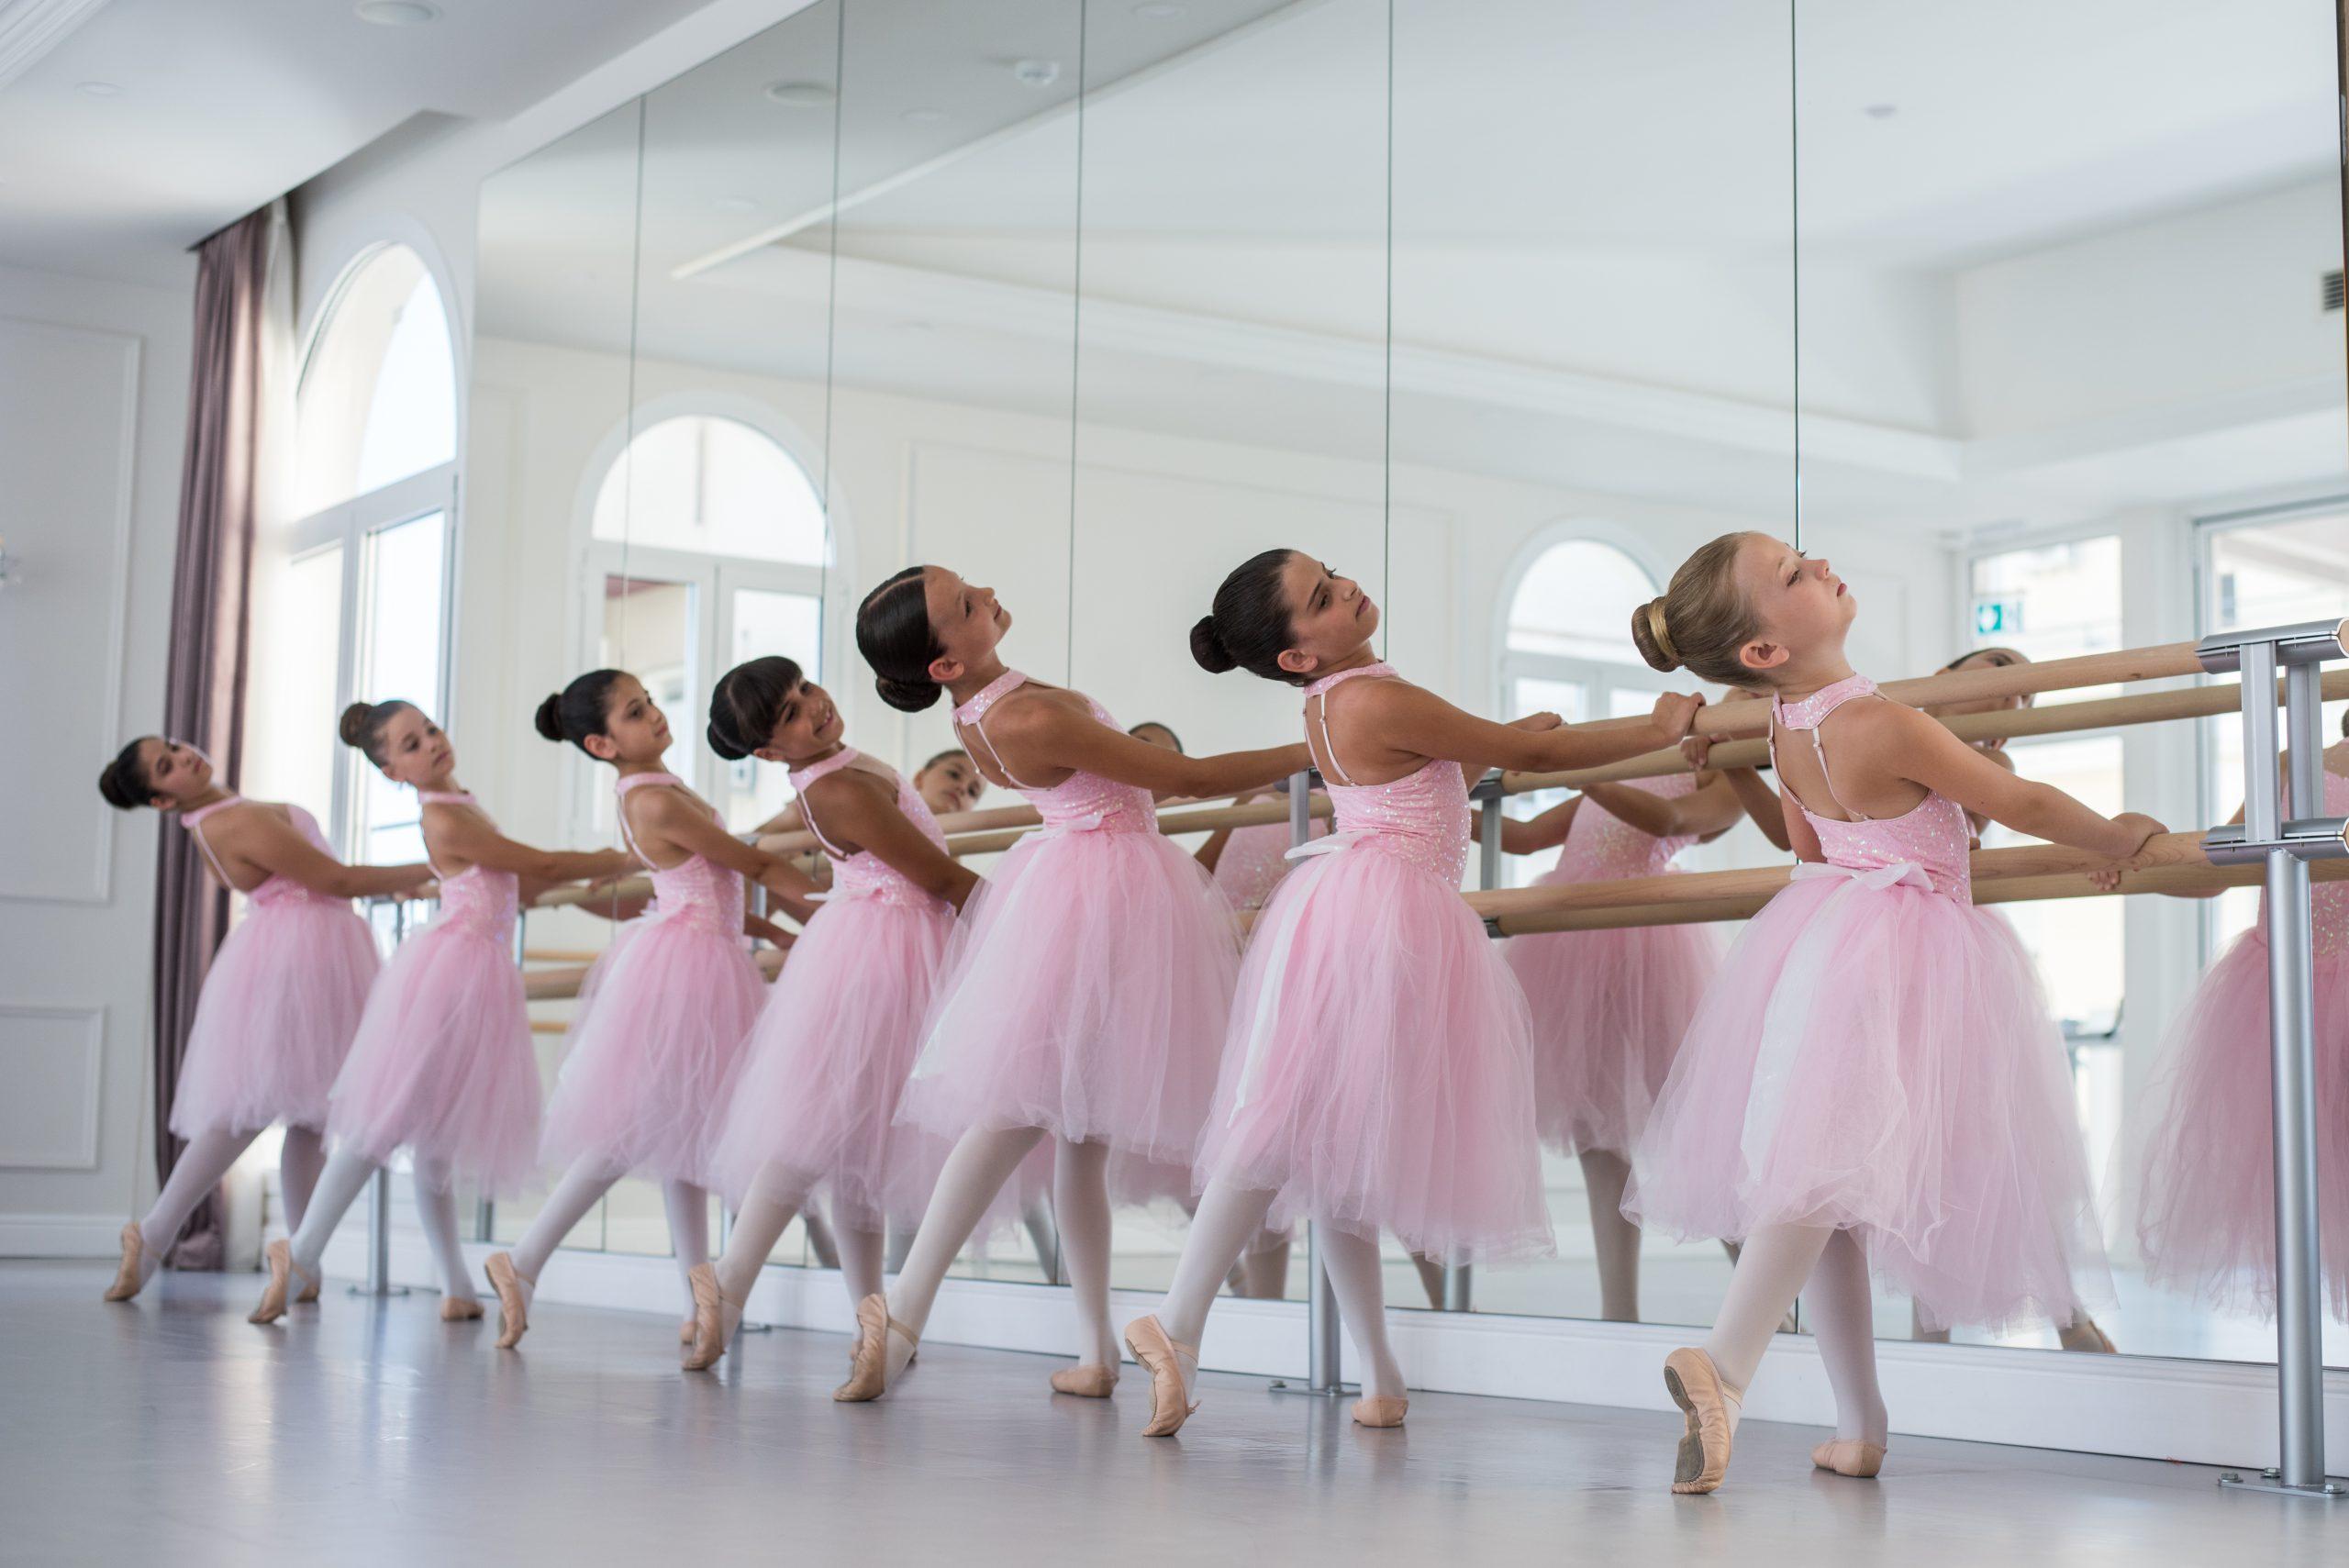 Maria Kokkinou School Of Ballet – ευεξία studio: Άρχισαν οι εγγραφές για την νέα σχολική χρονιά 2020-2021